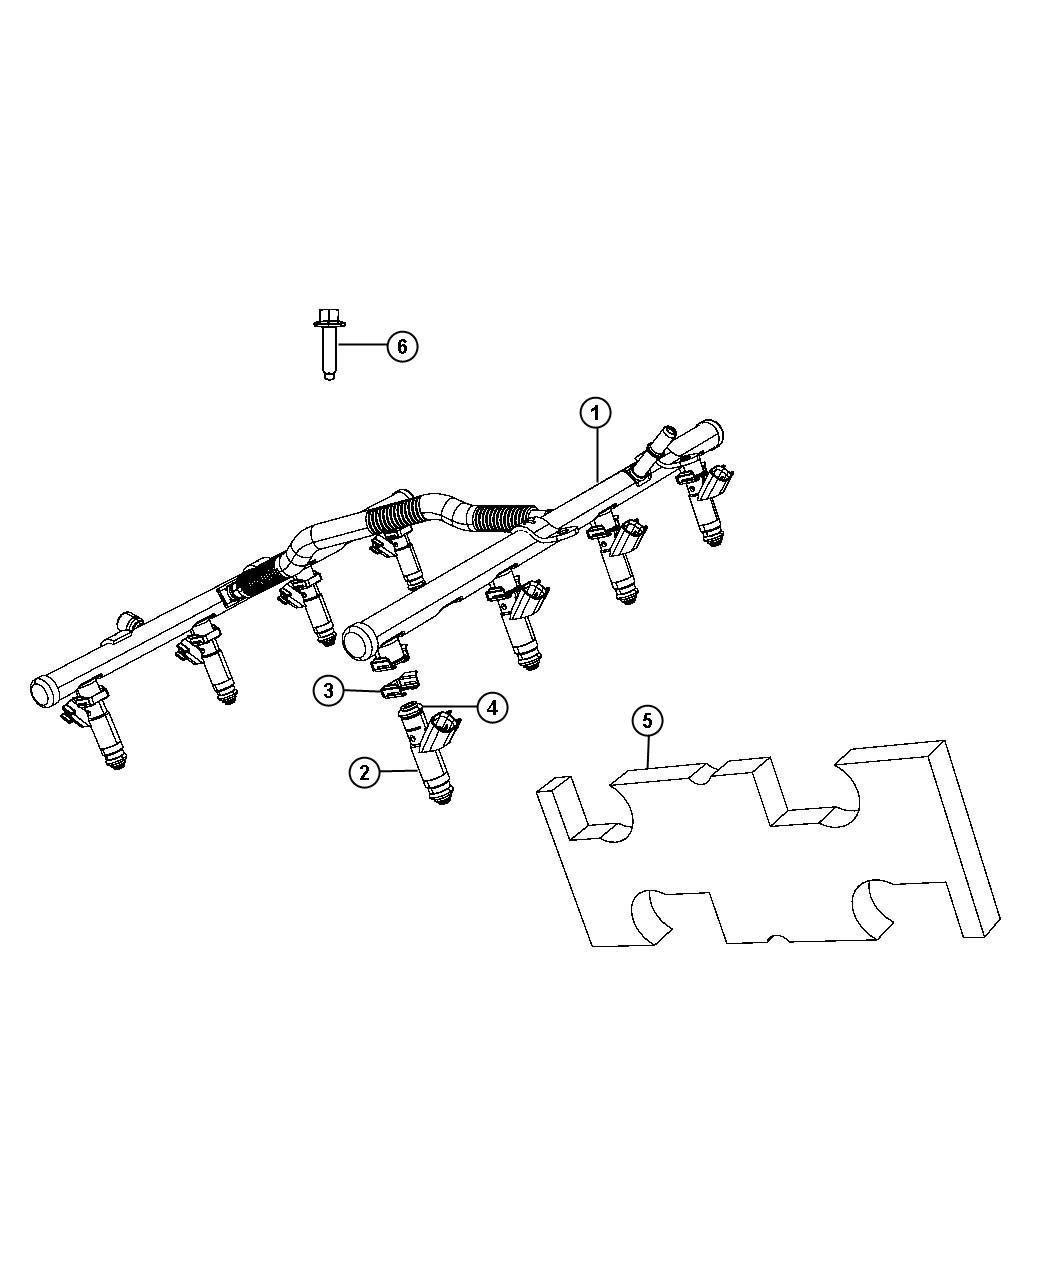 Dodge Ram 1500 Rail. Fuel. [5.7l v8 hemi mds vct engine